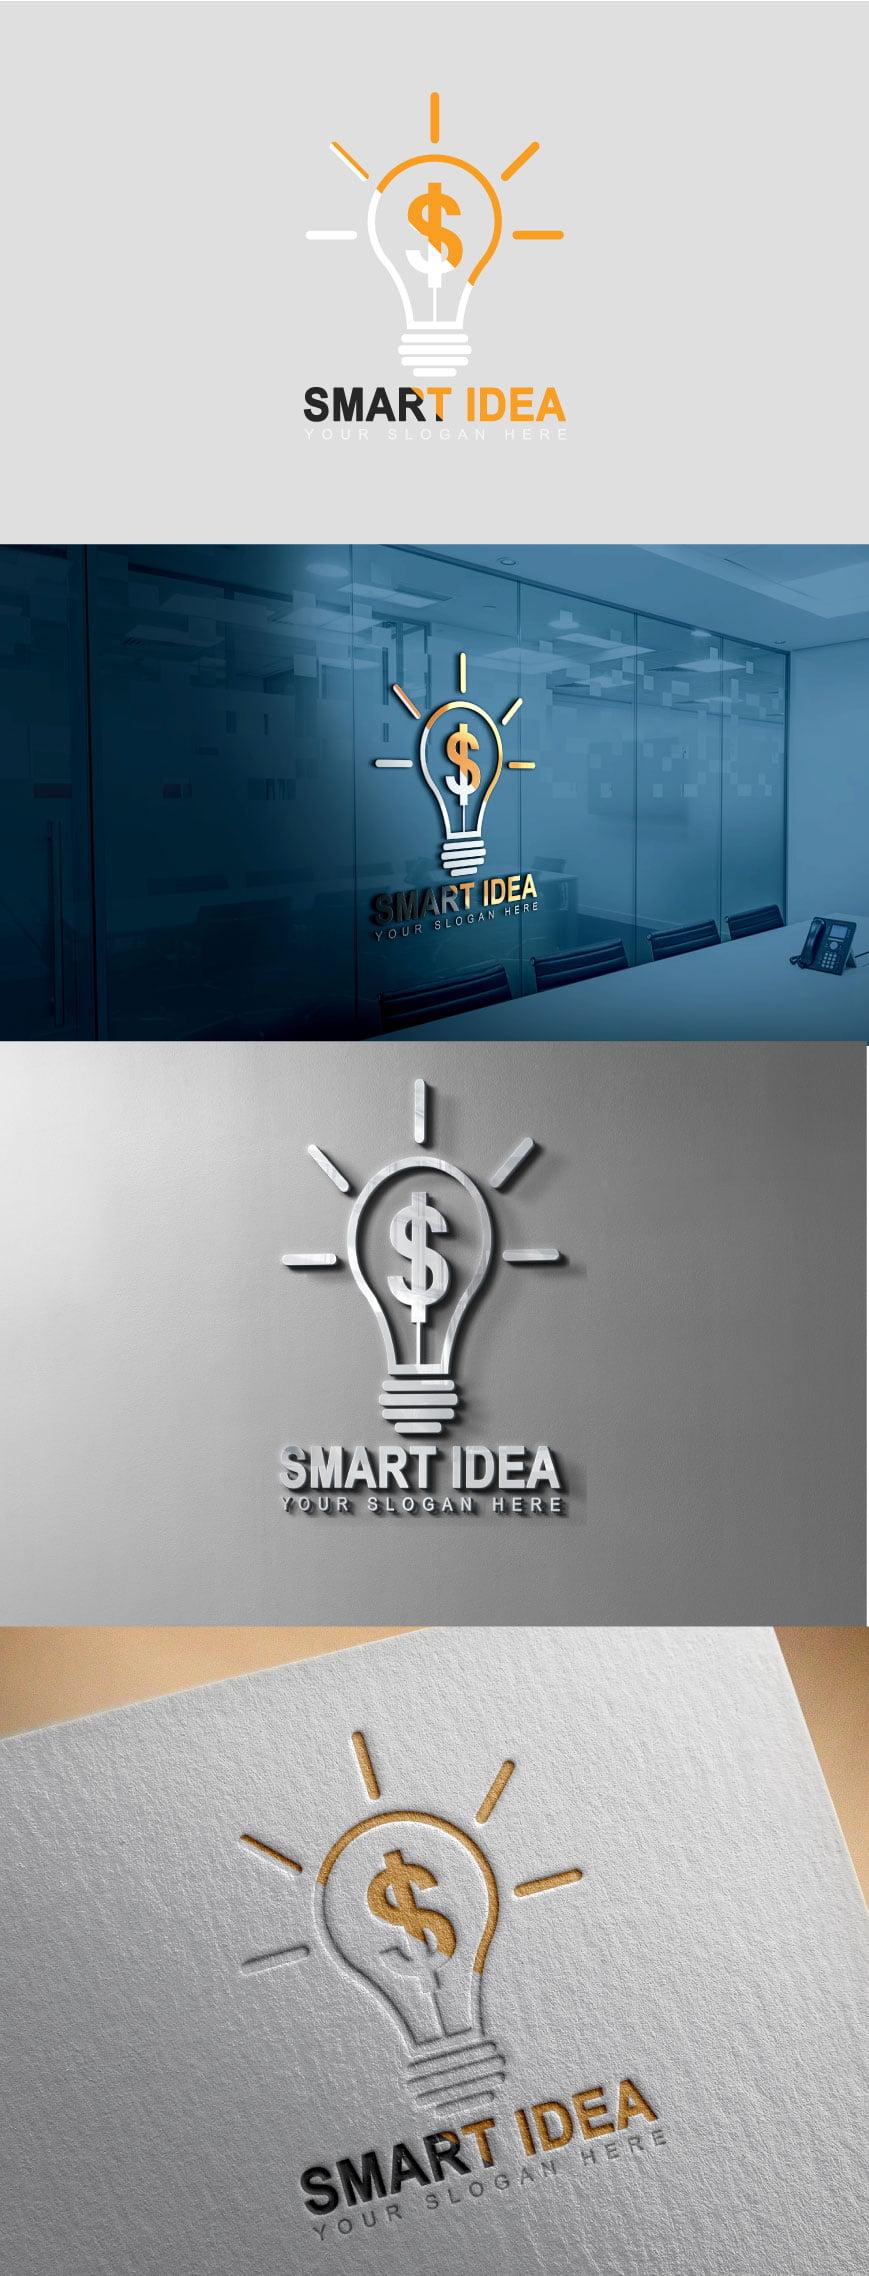 Smart Idea logo design psd